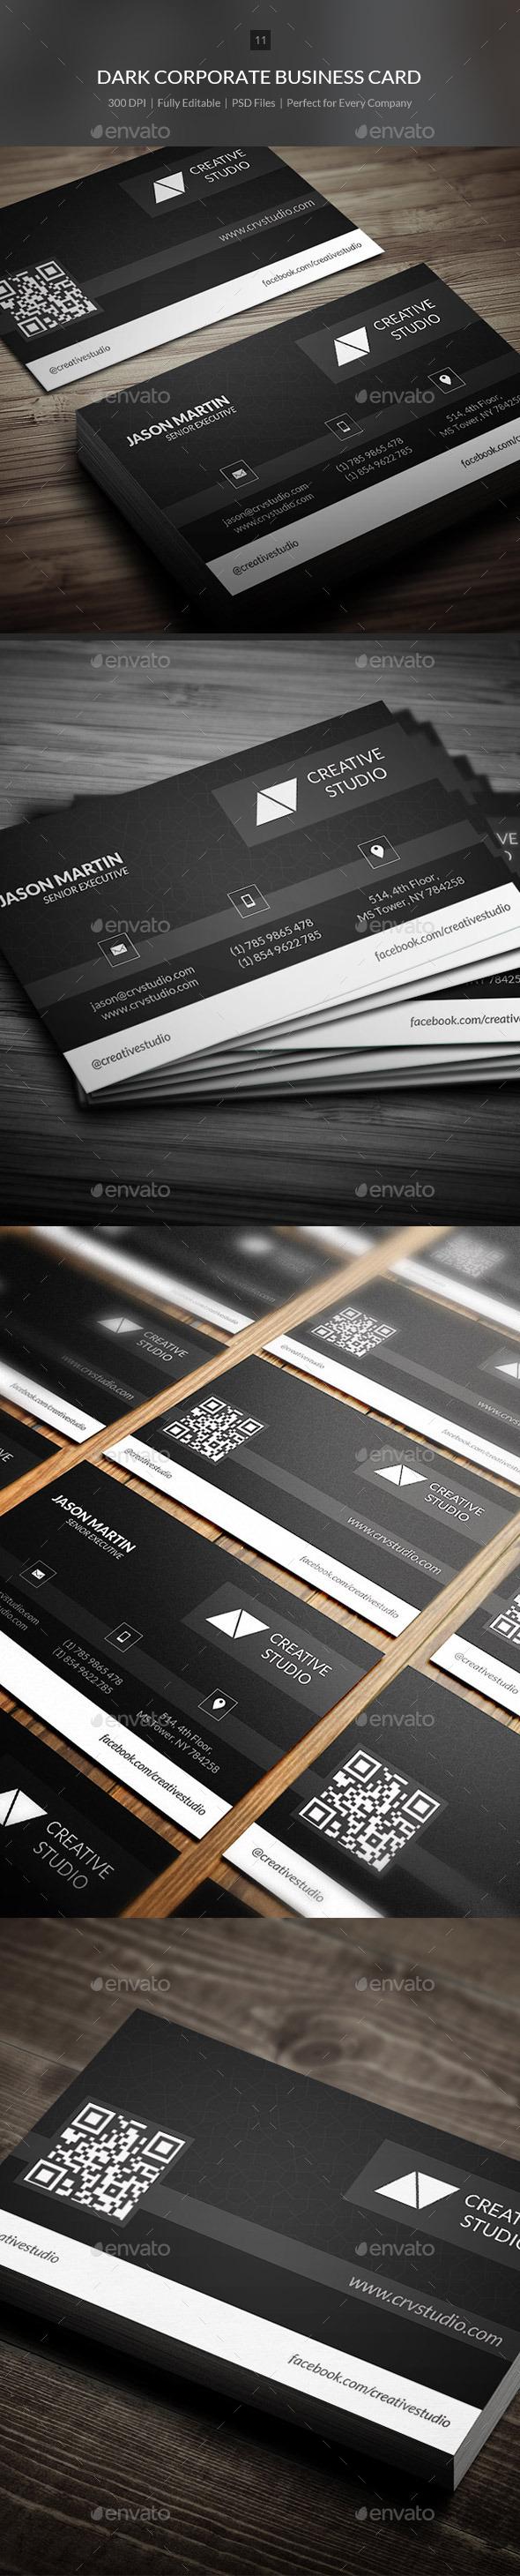 Dark Corporate Business Card - 11 - Corporate Business Cards